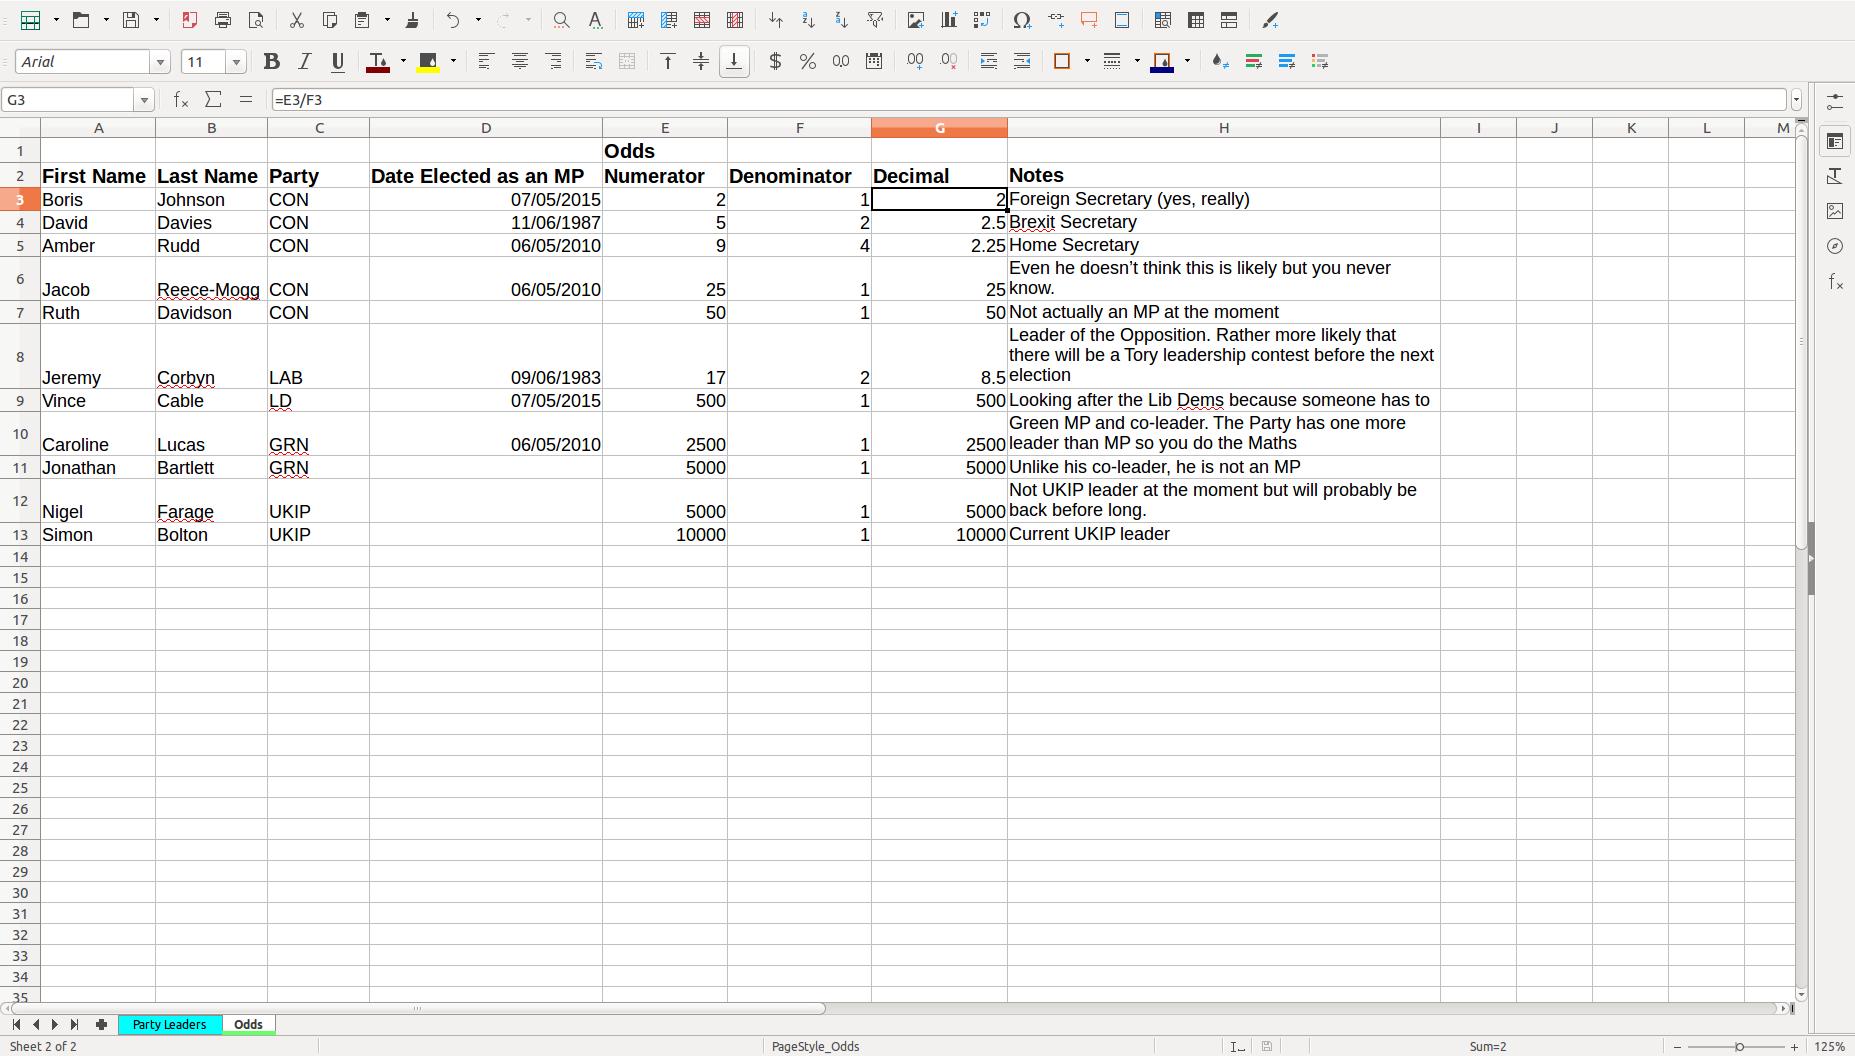 Excel Spreadsheet Database Spreadsheet Downloa excel